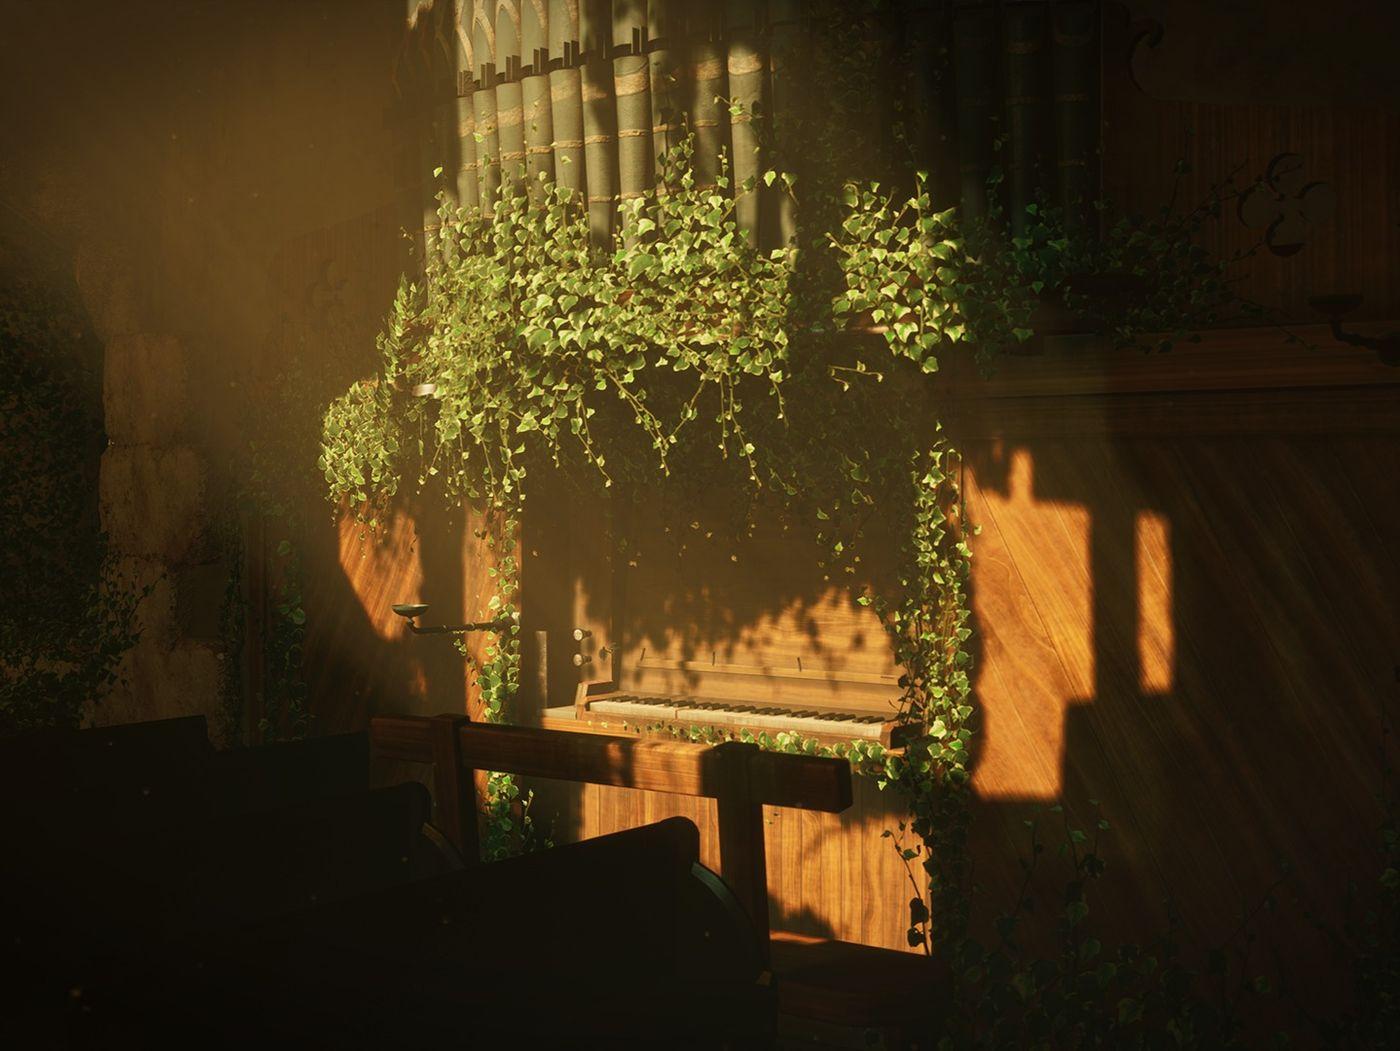 Robert Drysdale - Environment and Lighting Artist